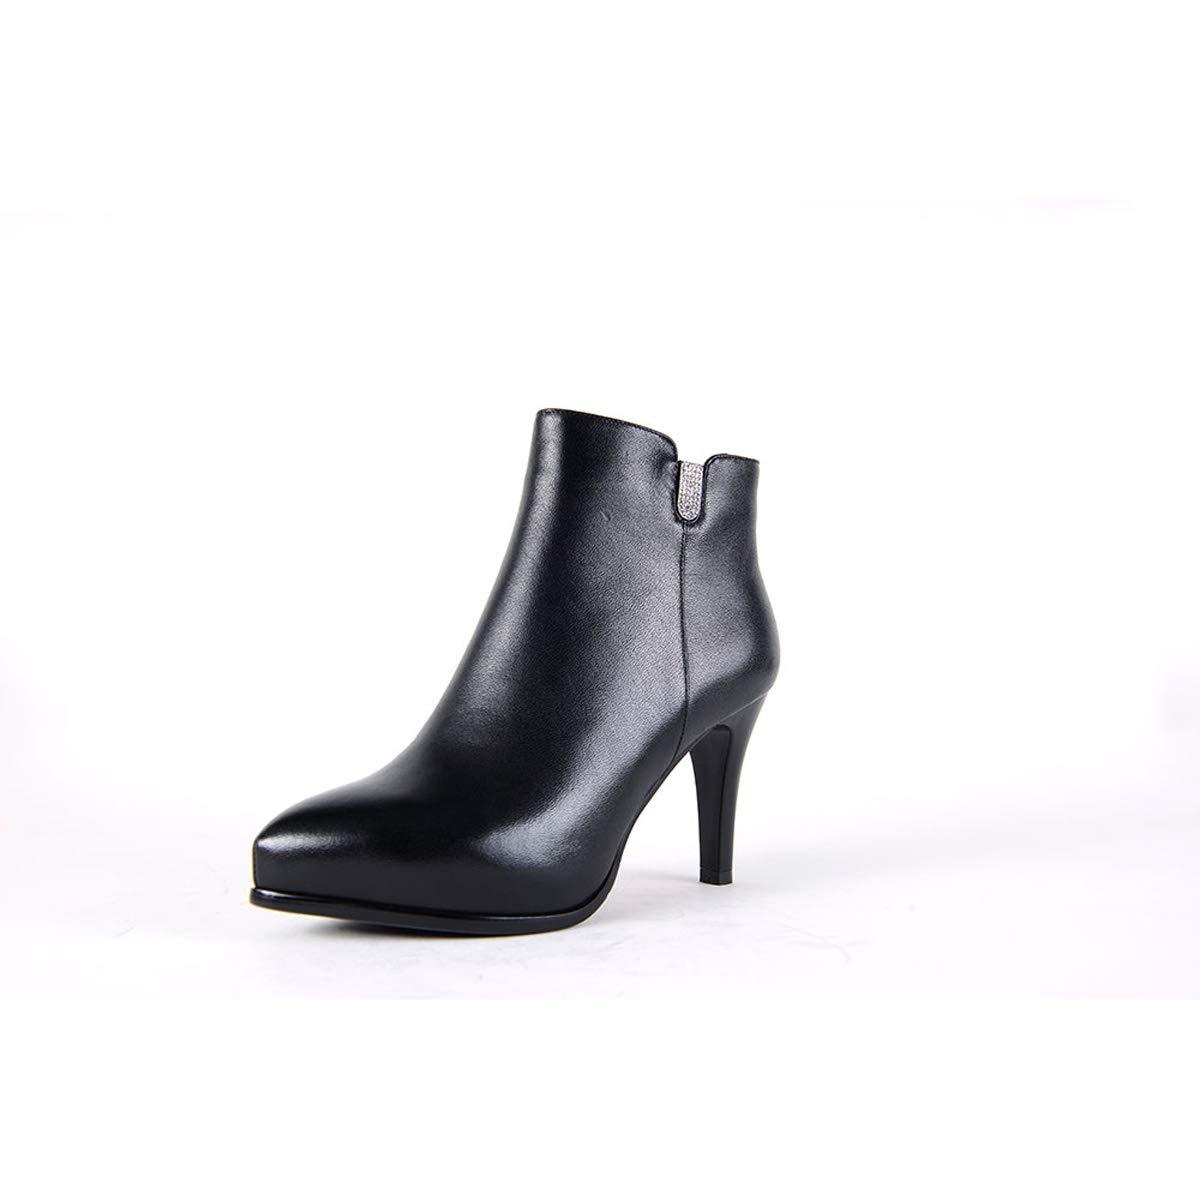 DANDANJIE Frauen Chelsea Spitzschuh Pfennigabsatz Damen Stiefeletten Reißverschluss Reißverschluss Reißverschluss High Heel Casual Stiefelies Schuhe Schwarz,schwarz,39EU e9b010